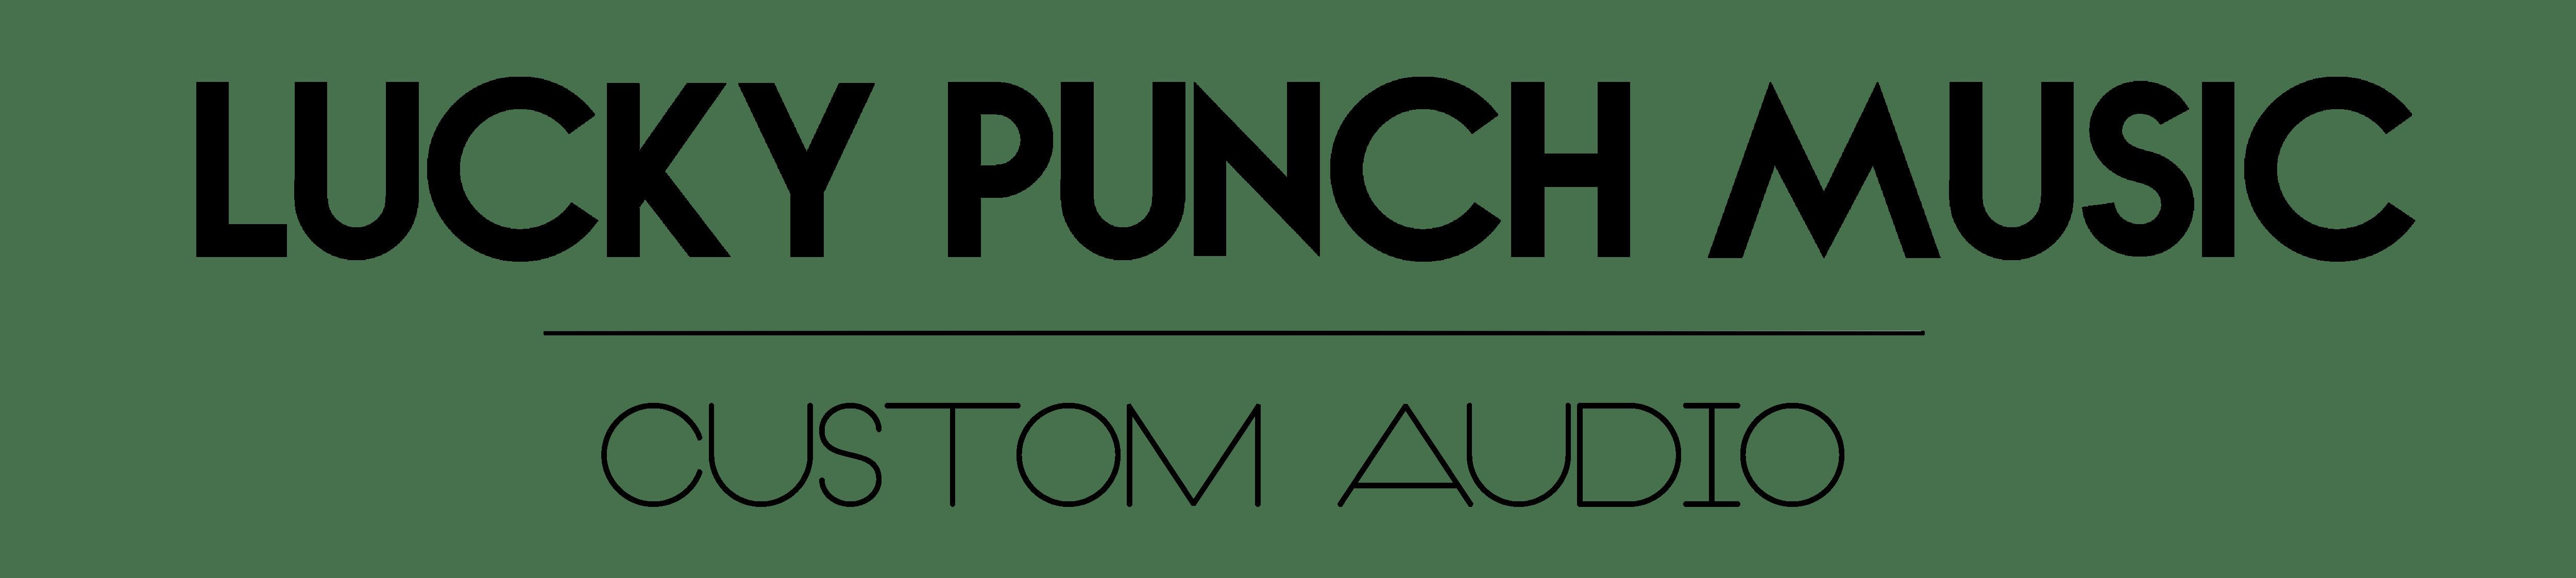 Lucky Punch Music